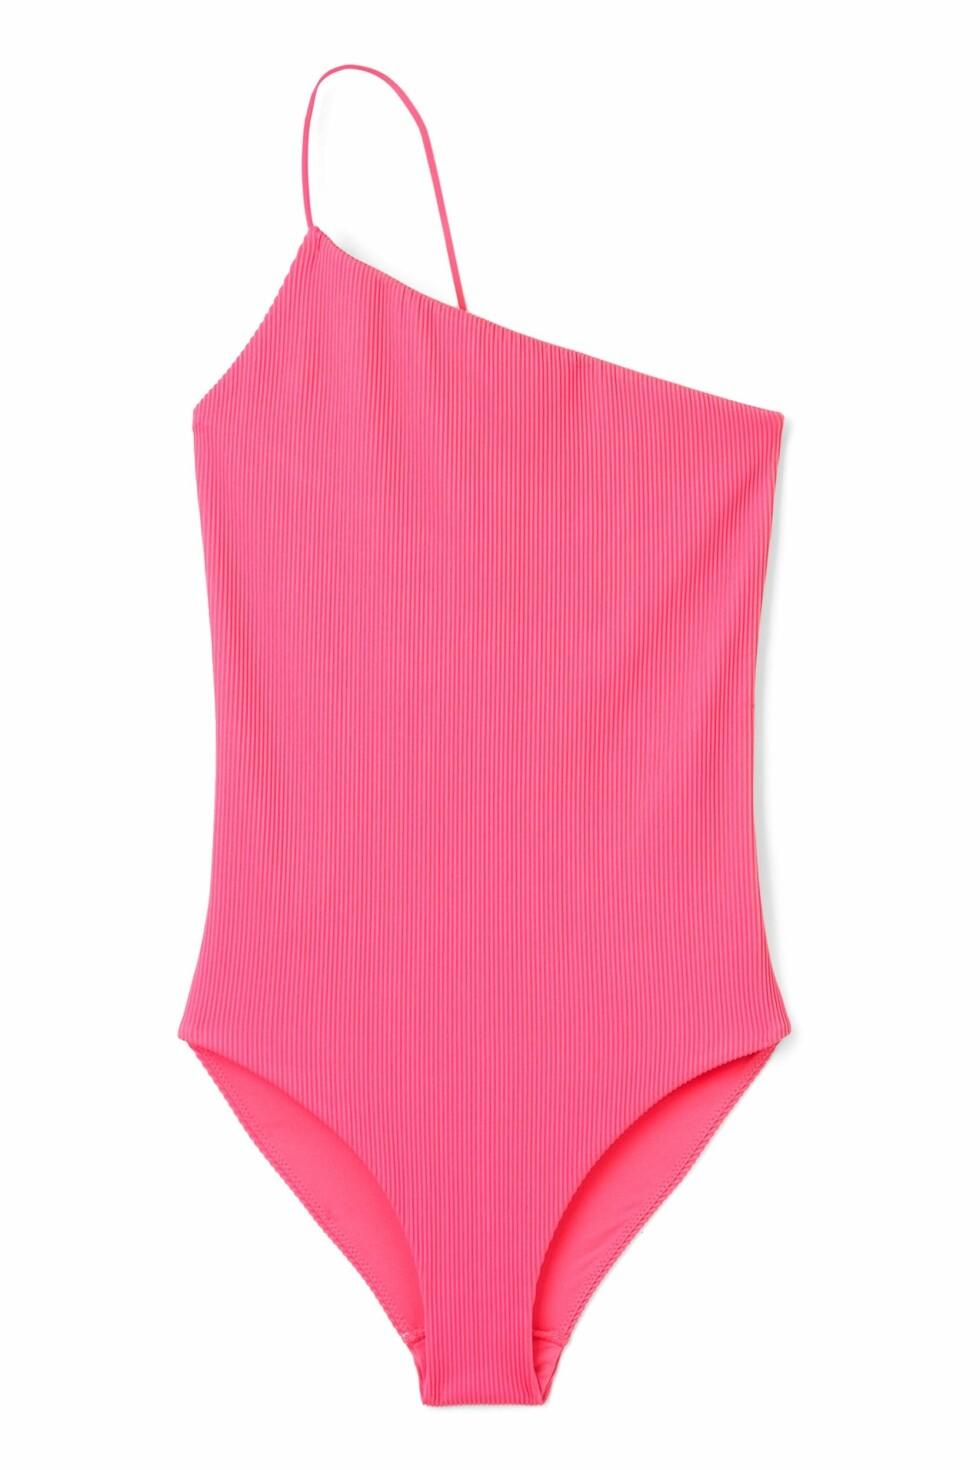 Badedrakt fra Weekday | kr 250 | http://shop.weekday.com/se/Womens_shop/Swimwear/All/Nola_Swimsuit/8278058-11581401.1#c-47958#Rel?PC=